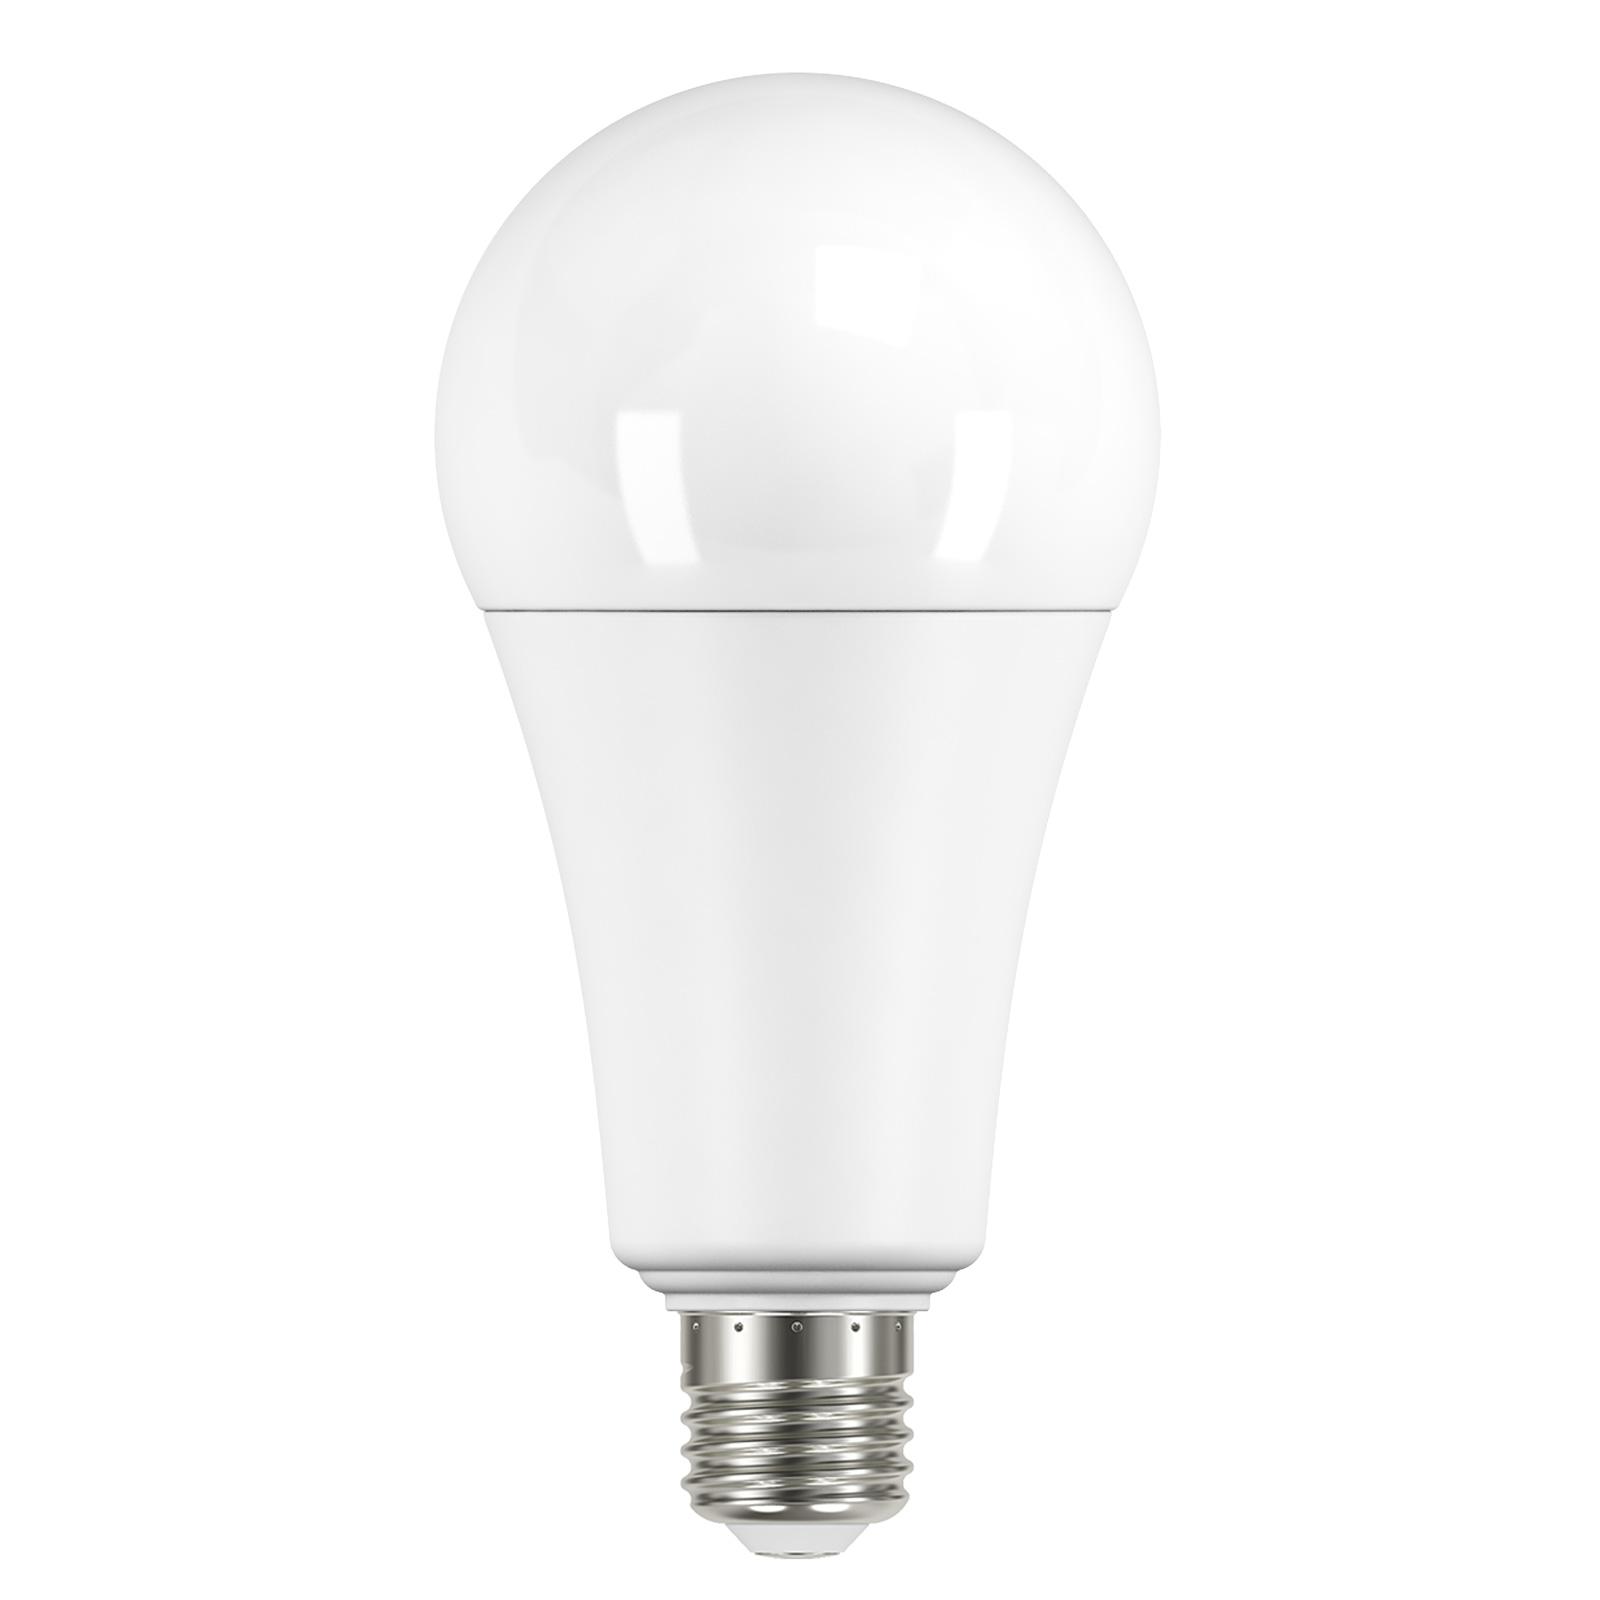 LED-Lampe E27 ToLEDo A60 19W opal, tageslicht